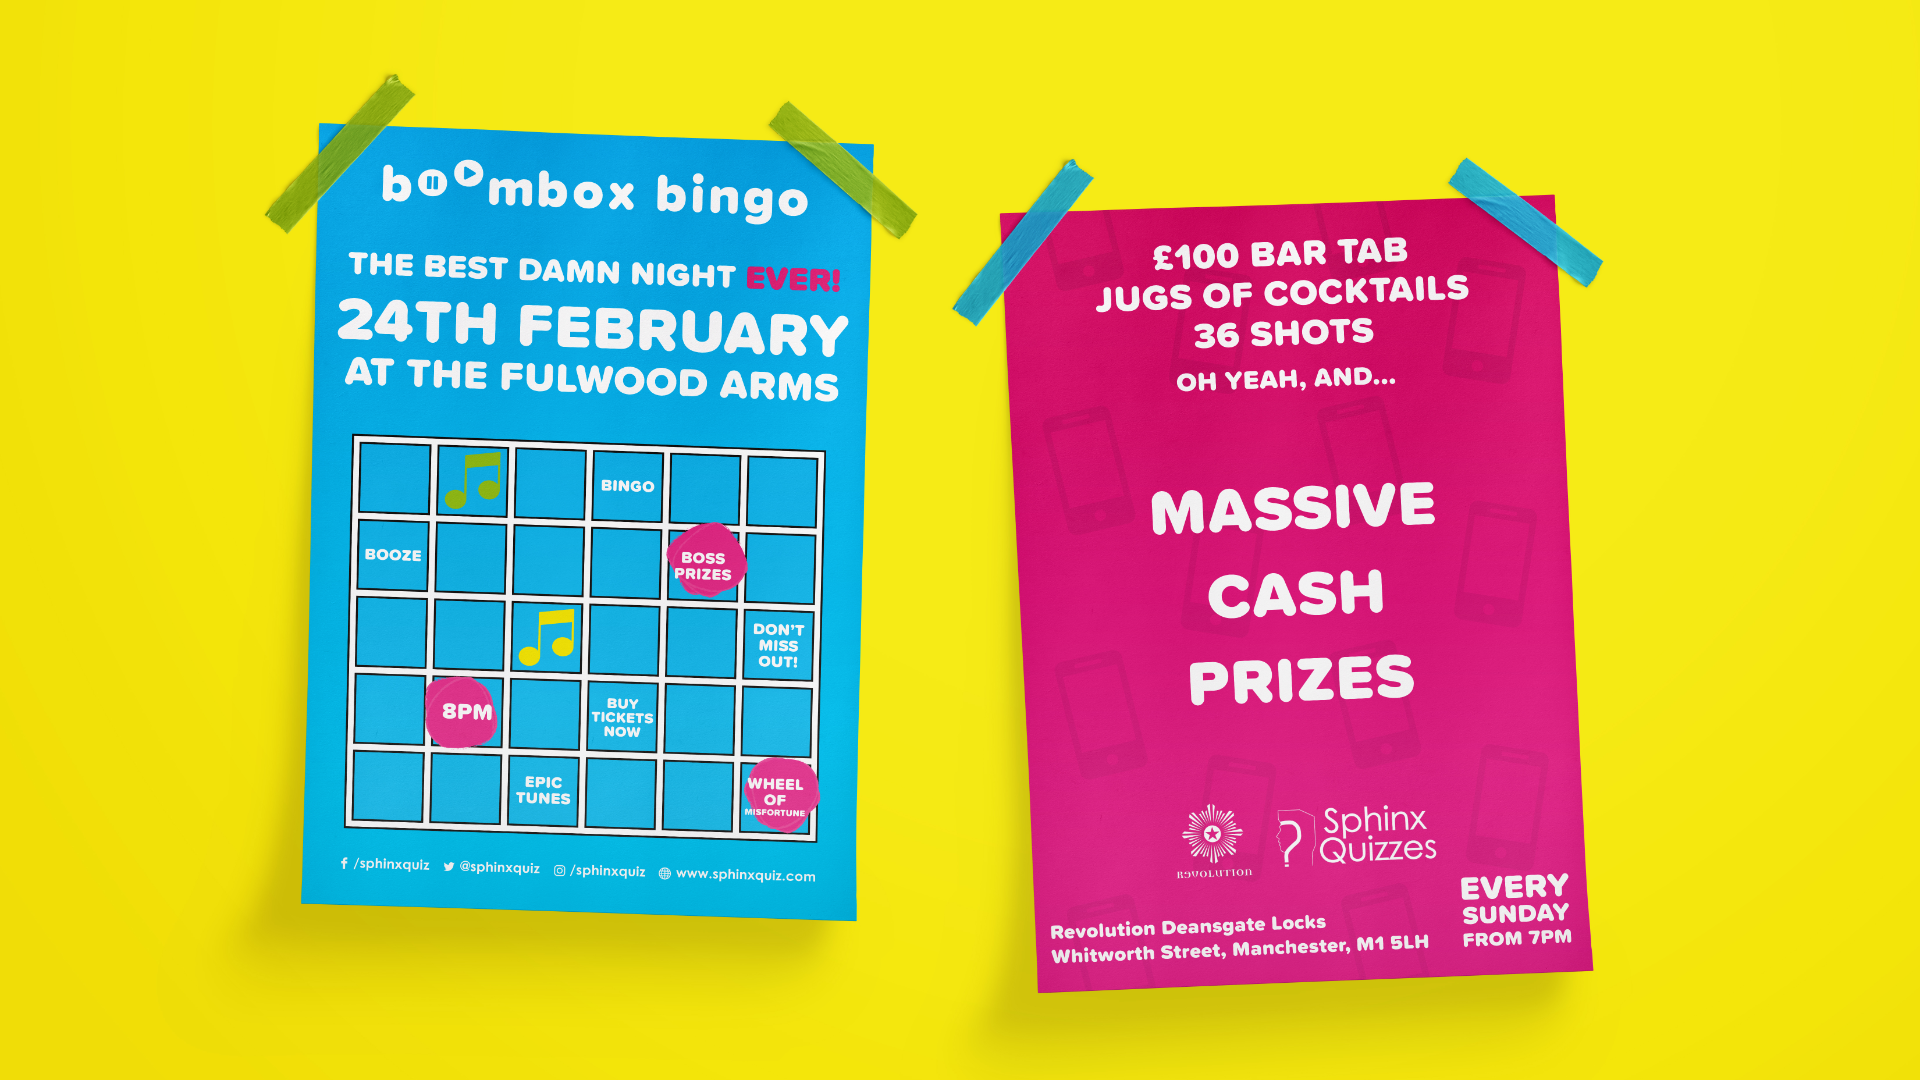 Music Bingo Brand Poster Print Design